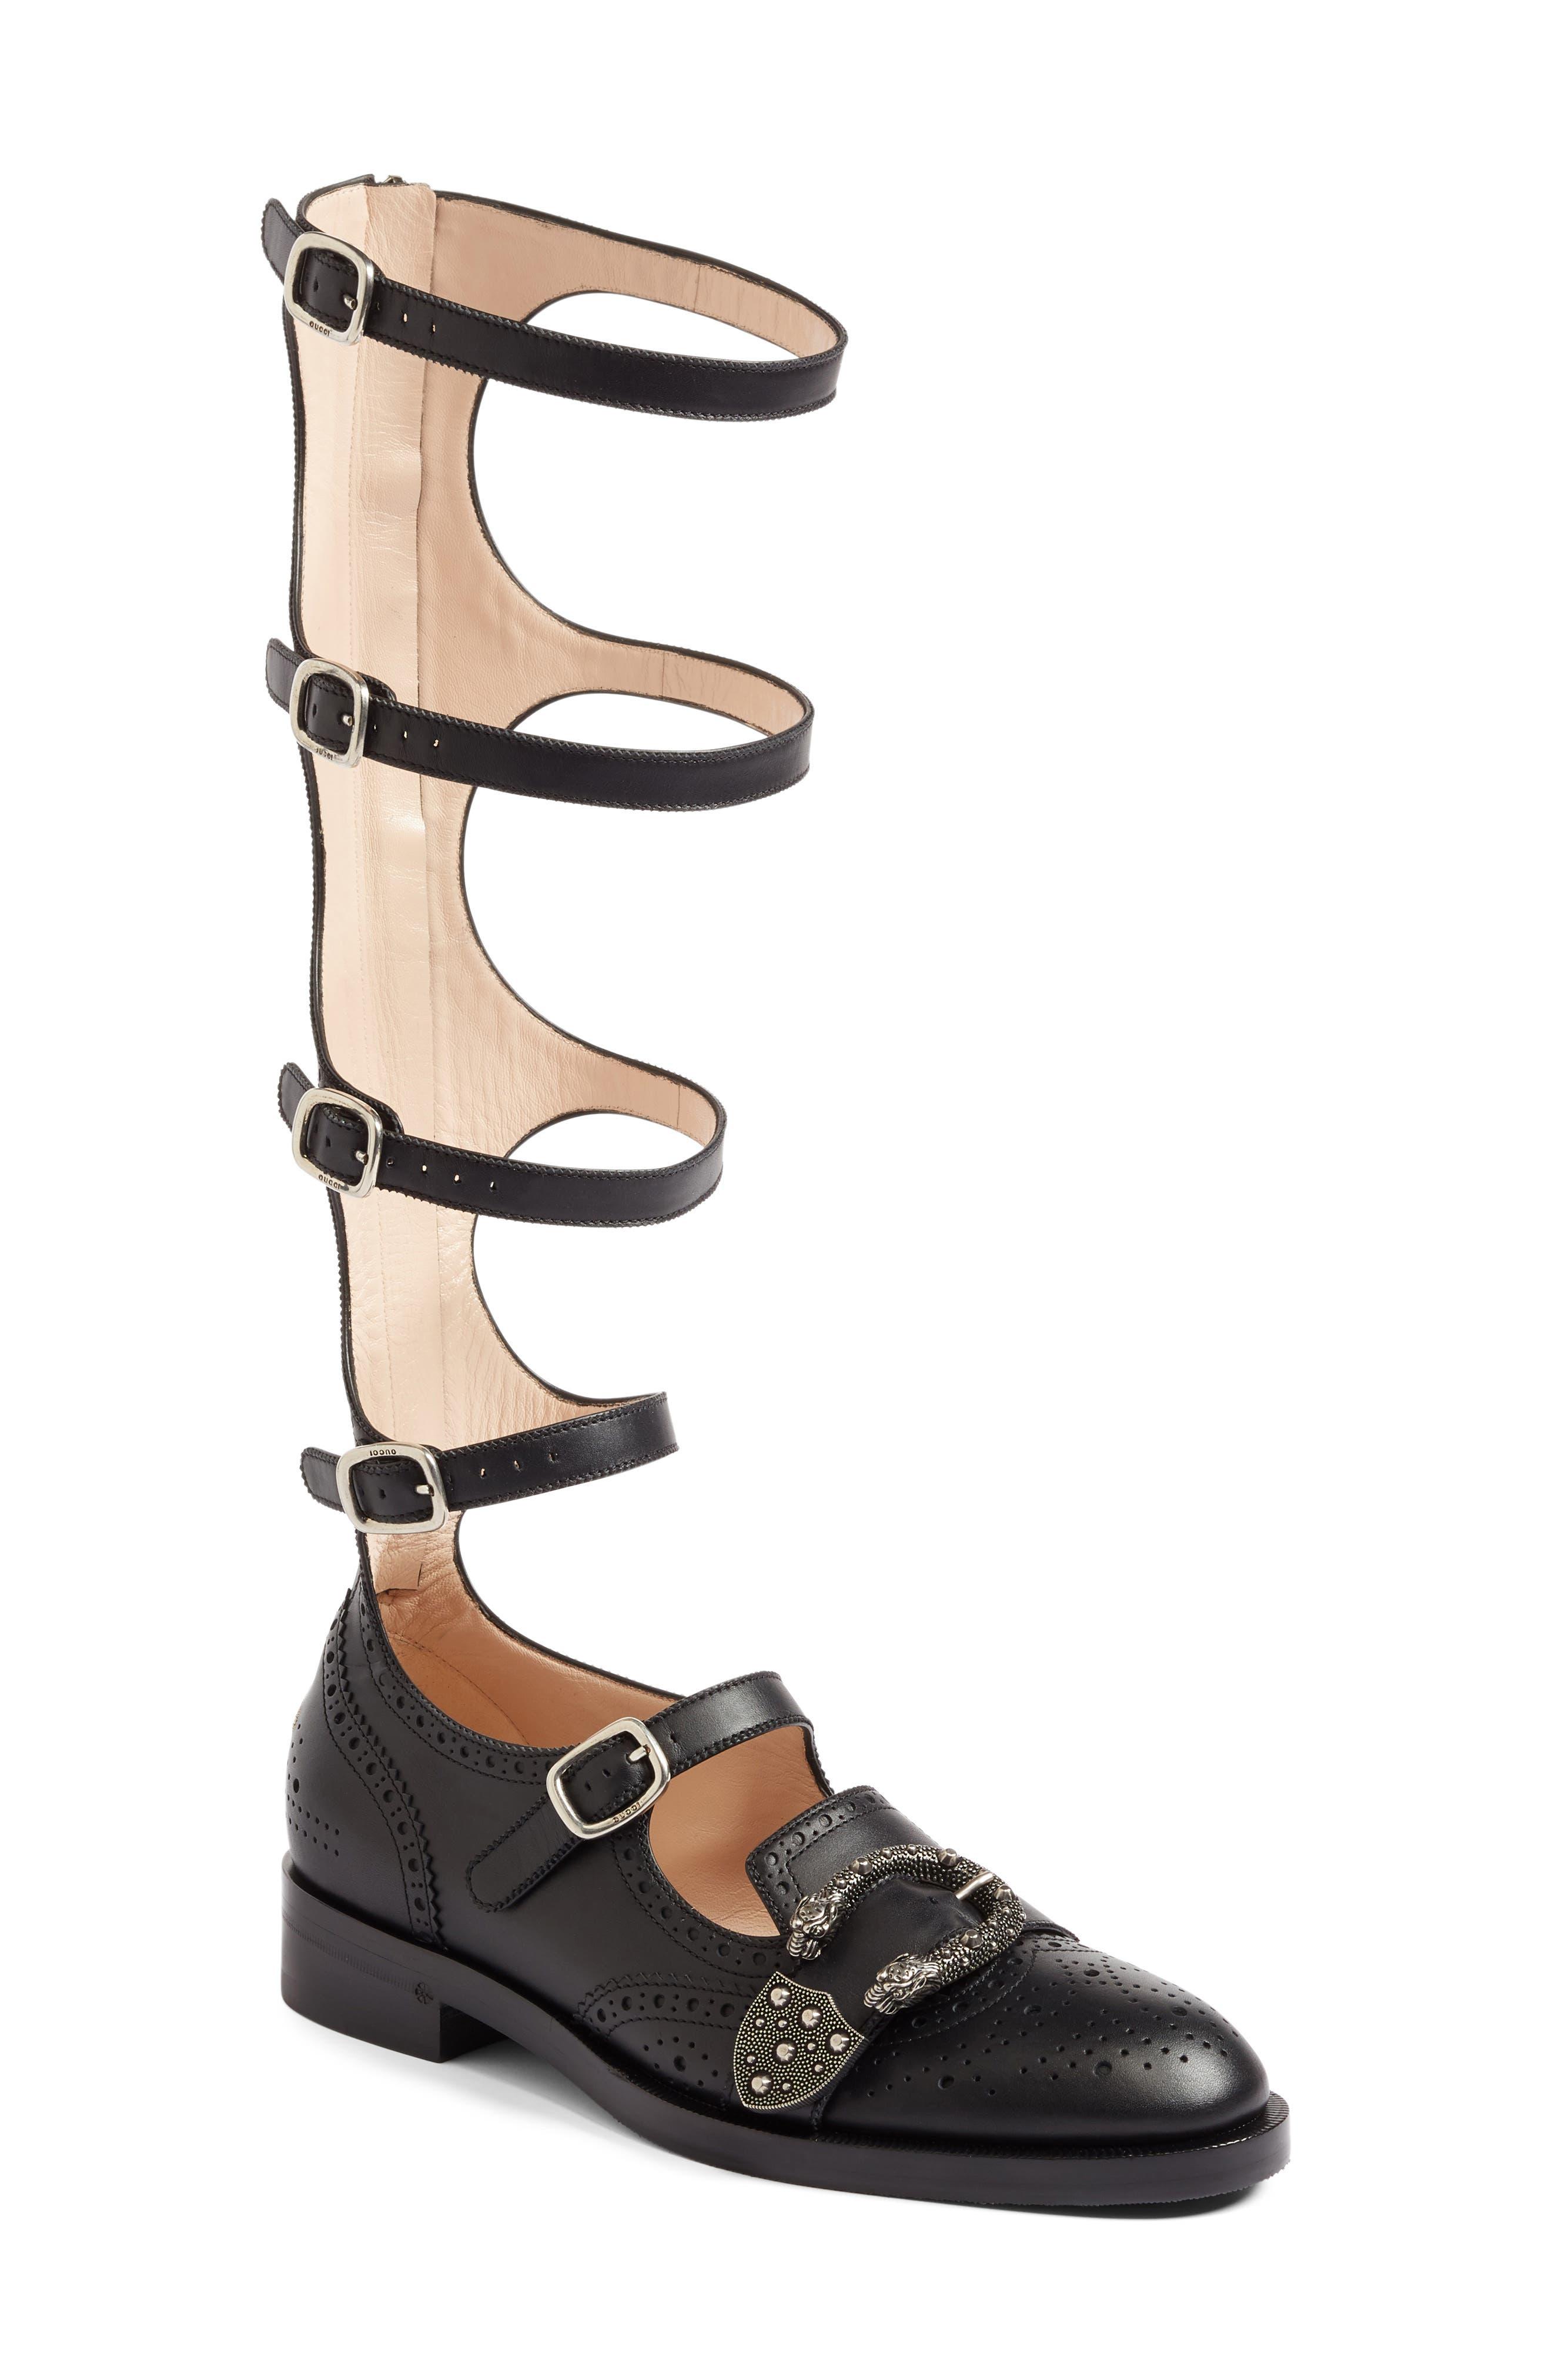 Main Image - Gucci Gladiator Loafer (Women)